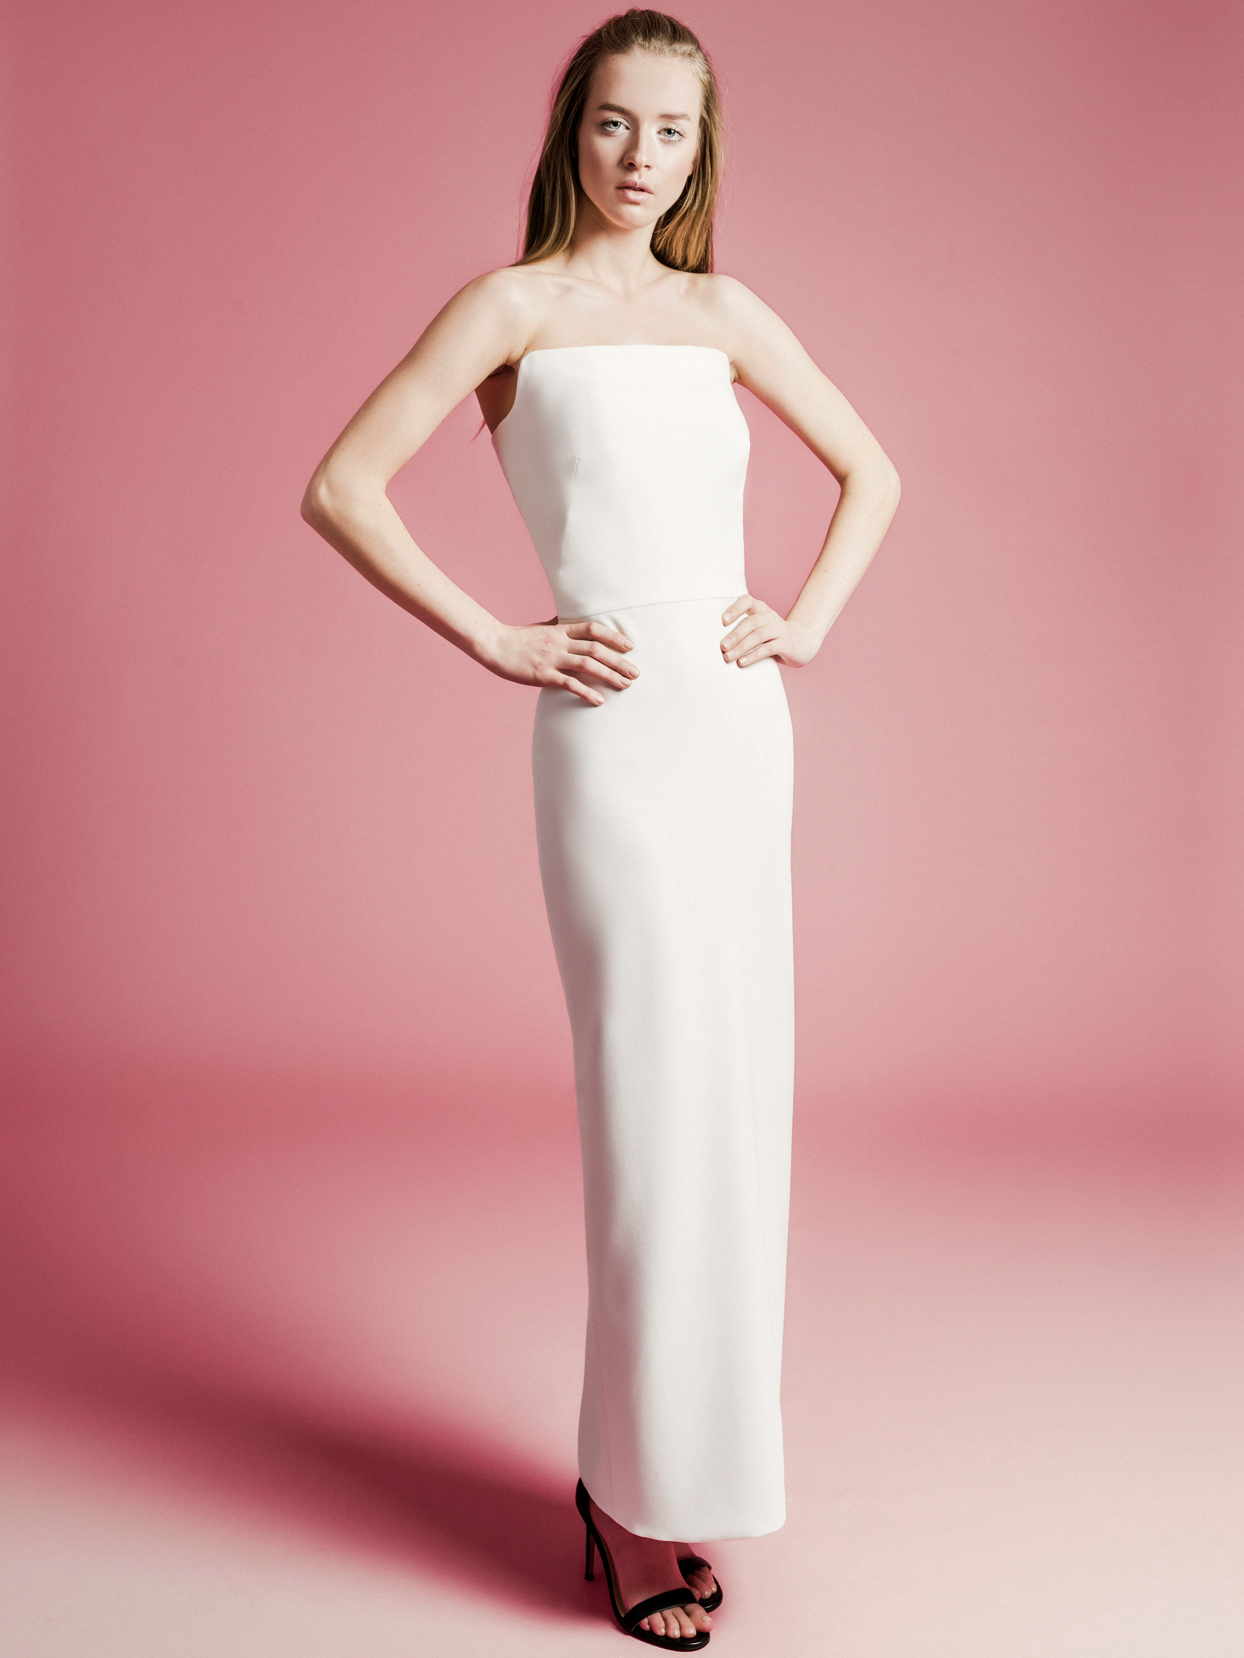 Sophie Et Voilà straight across strapless wedding dress spring 2021